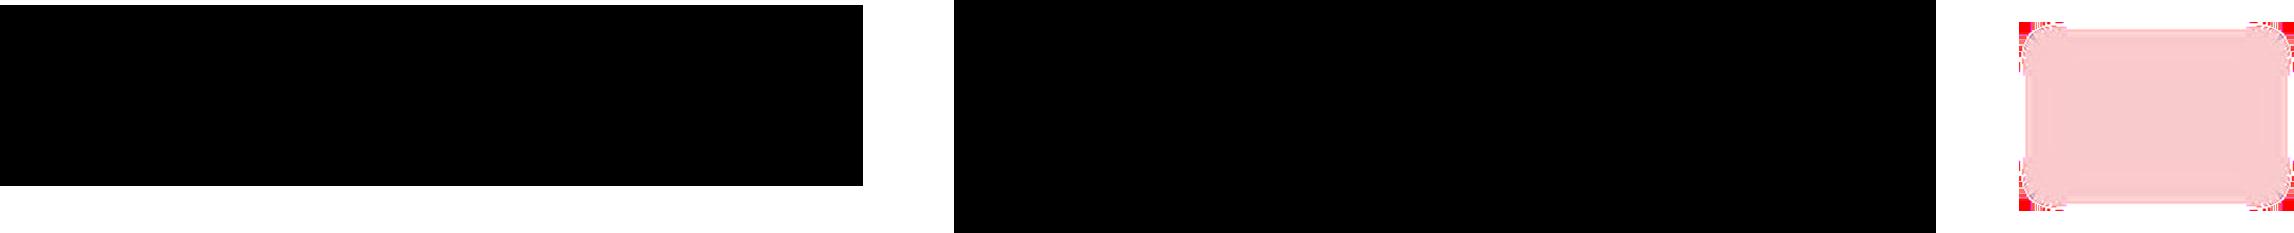 Tröber Castingbase